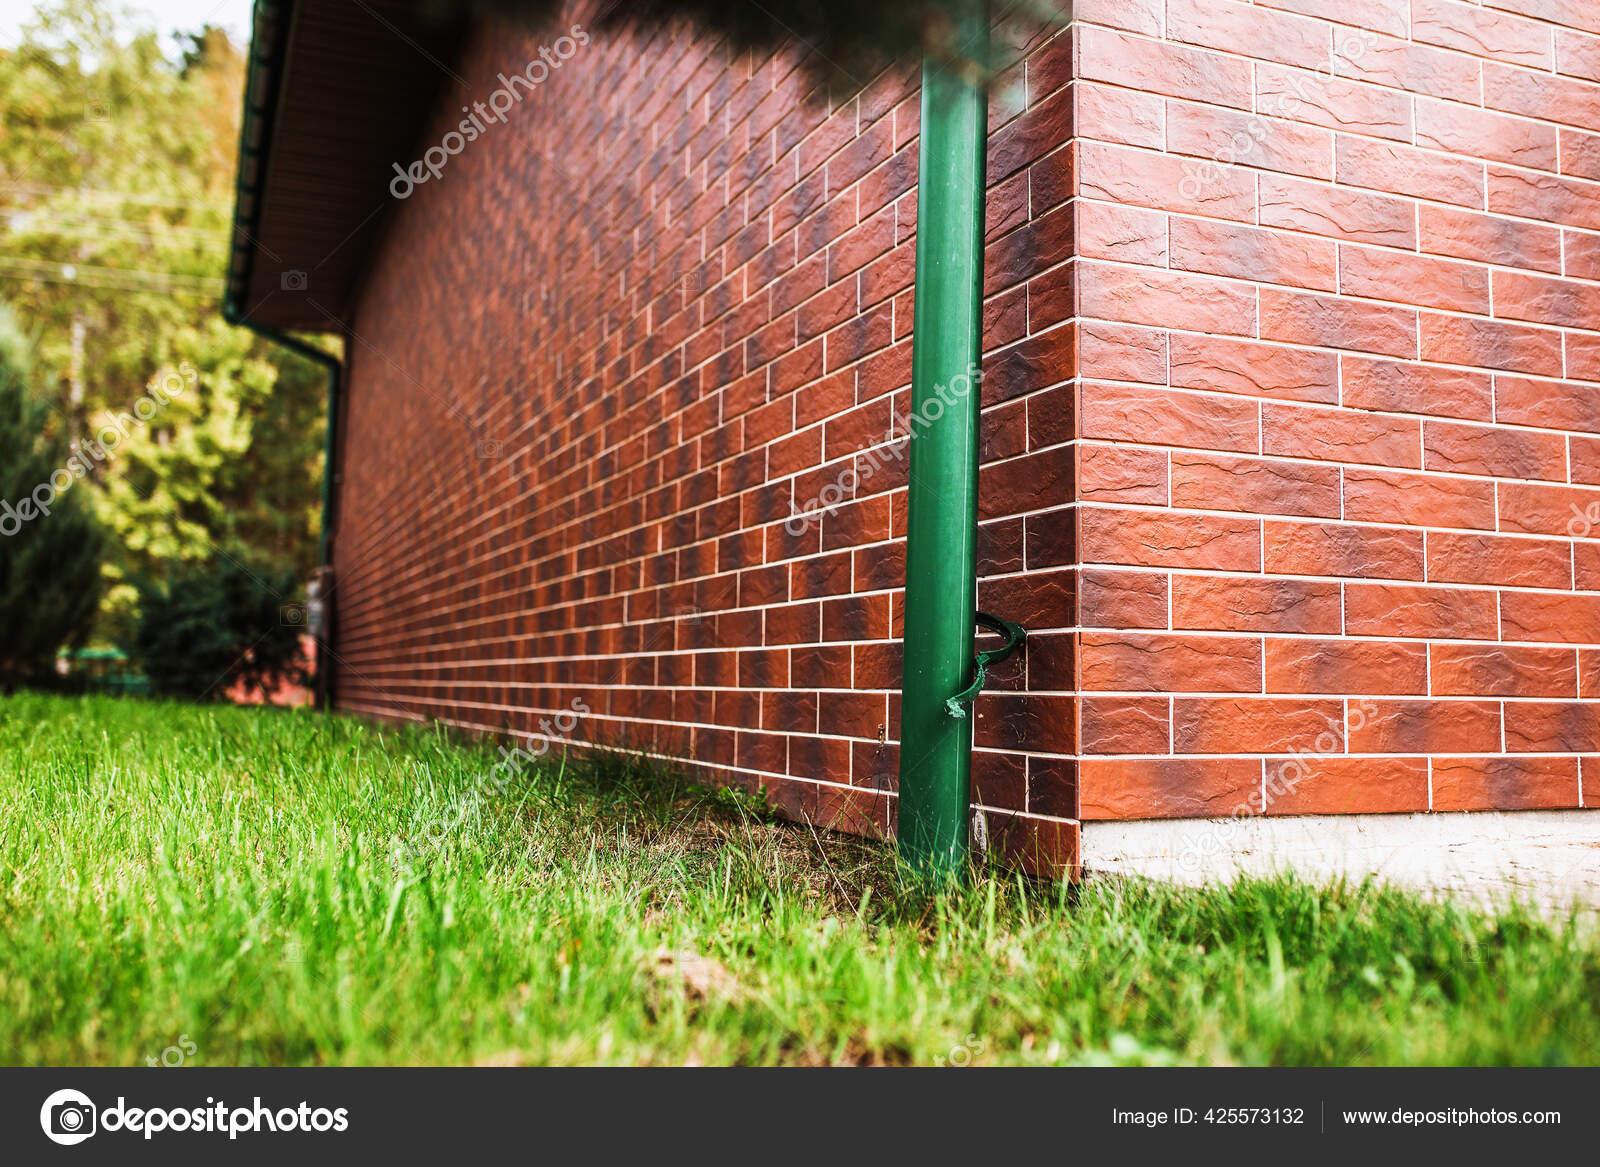 Exterior Wall Decoration House Ceramic Tiles Imitation Red Brick Exterior Stock Photo C Andreygonchar 425573132